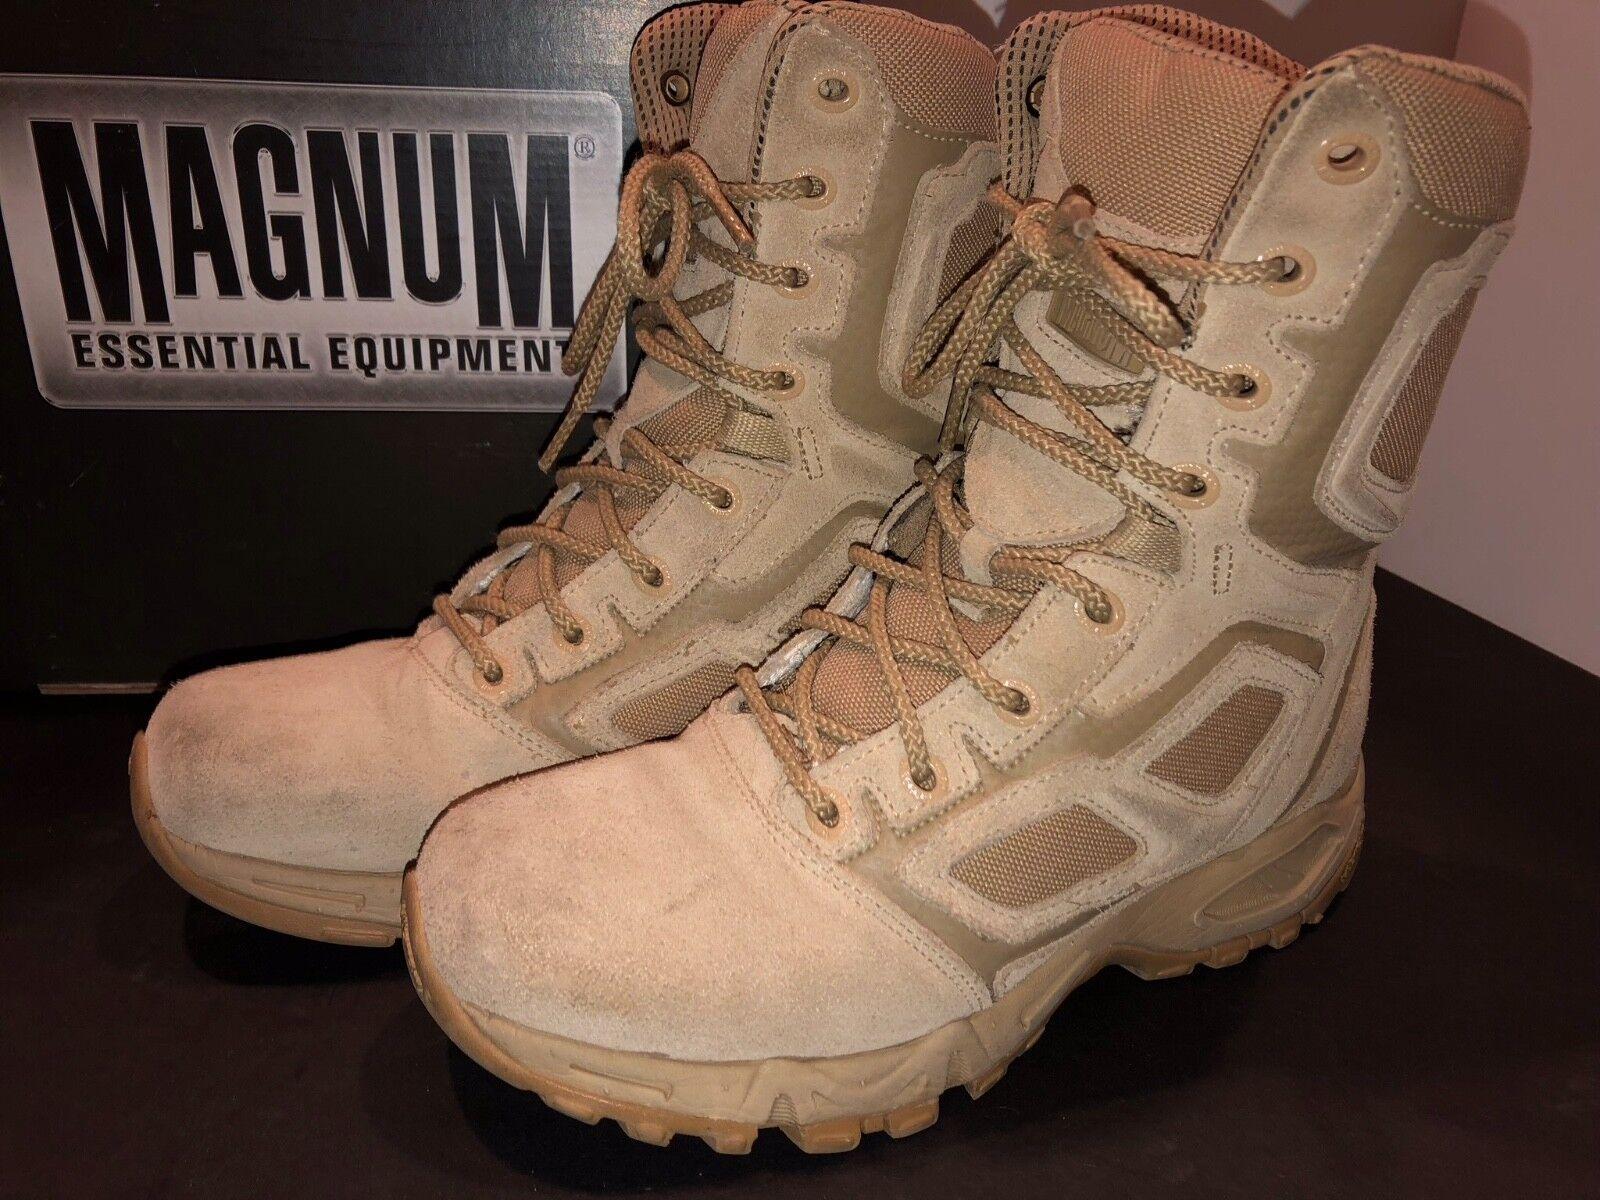 Magnum Elite Spider 8.0 Wos Desierto Tan Tan Desierto Tácticos Ejército botas De Combate Militar-SZ-7 edc723